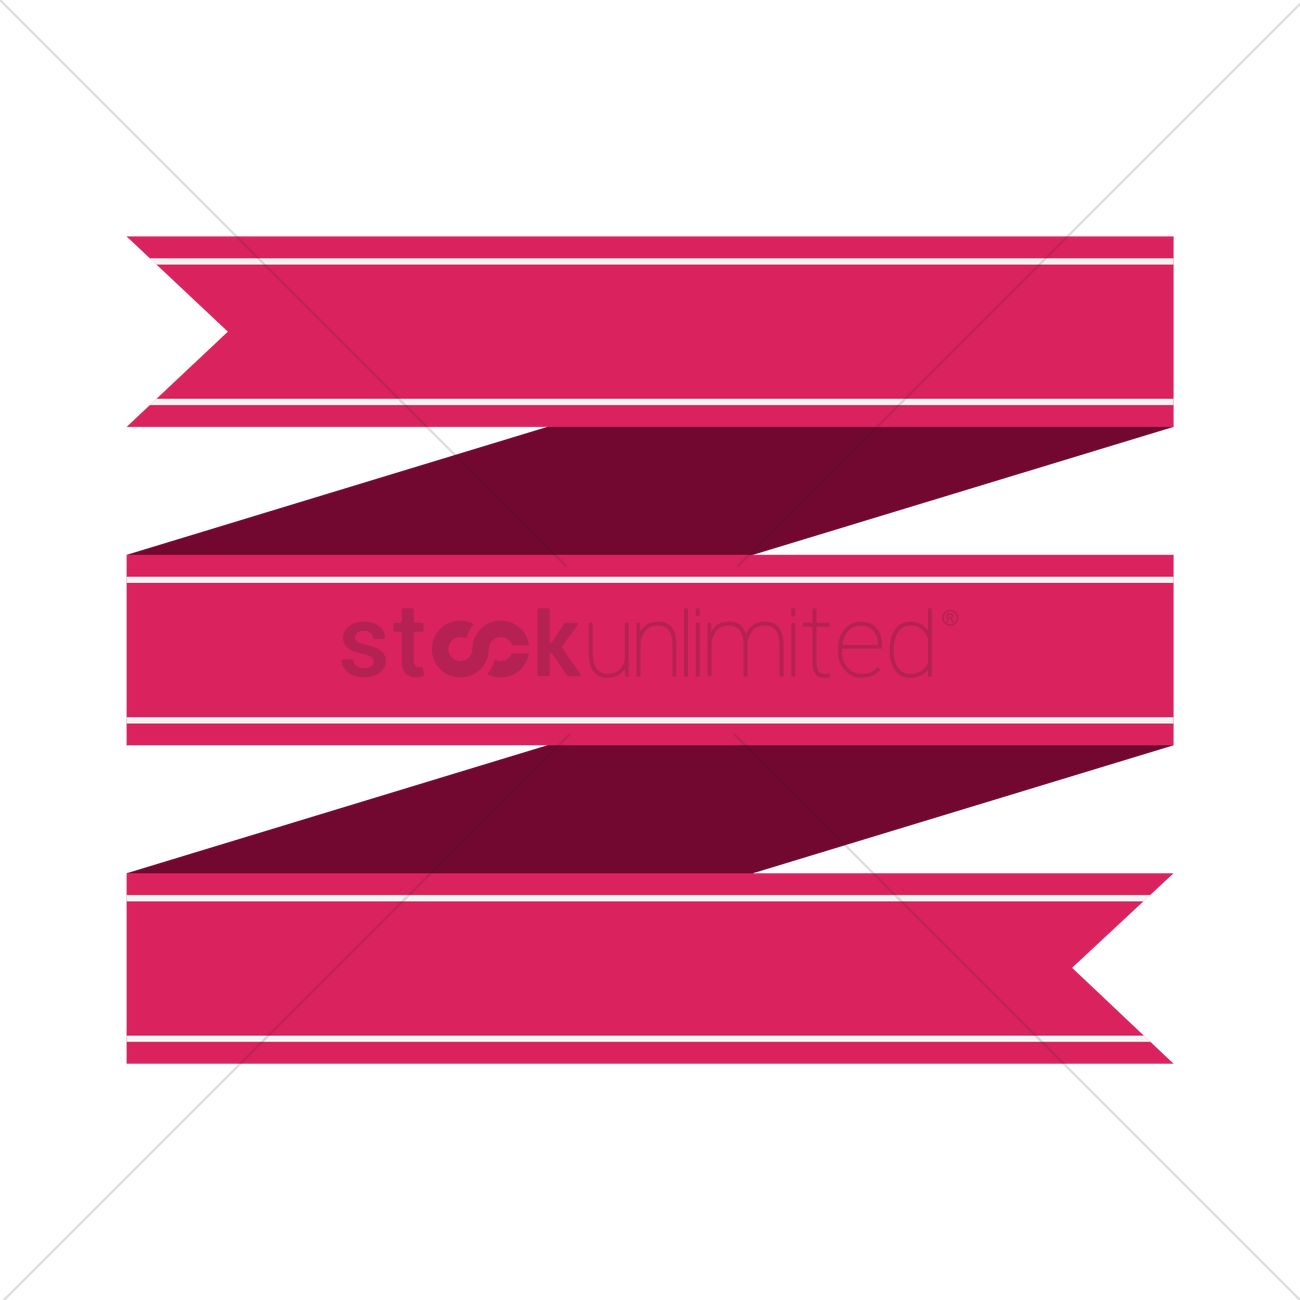 Ribbon banner design Vector Image - 1467046 | StockUnlimited for Vector Banner Graphics Design Png  131fsj